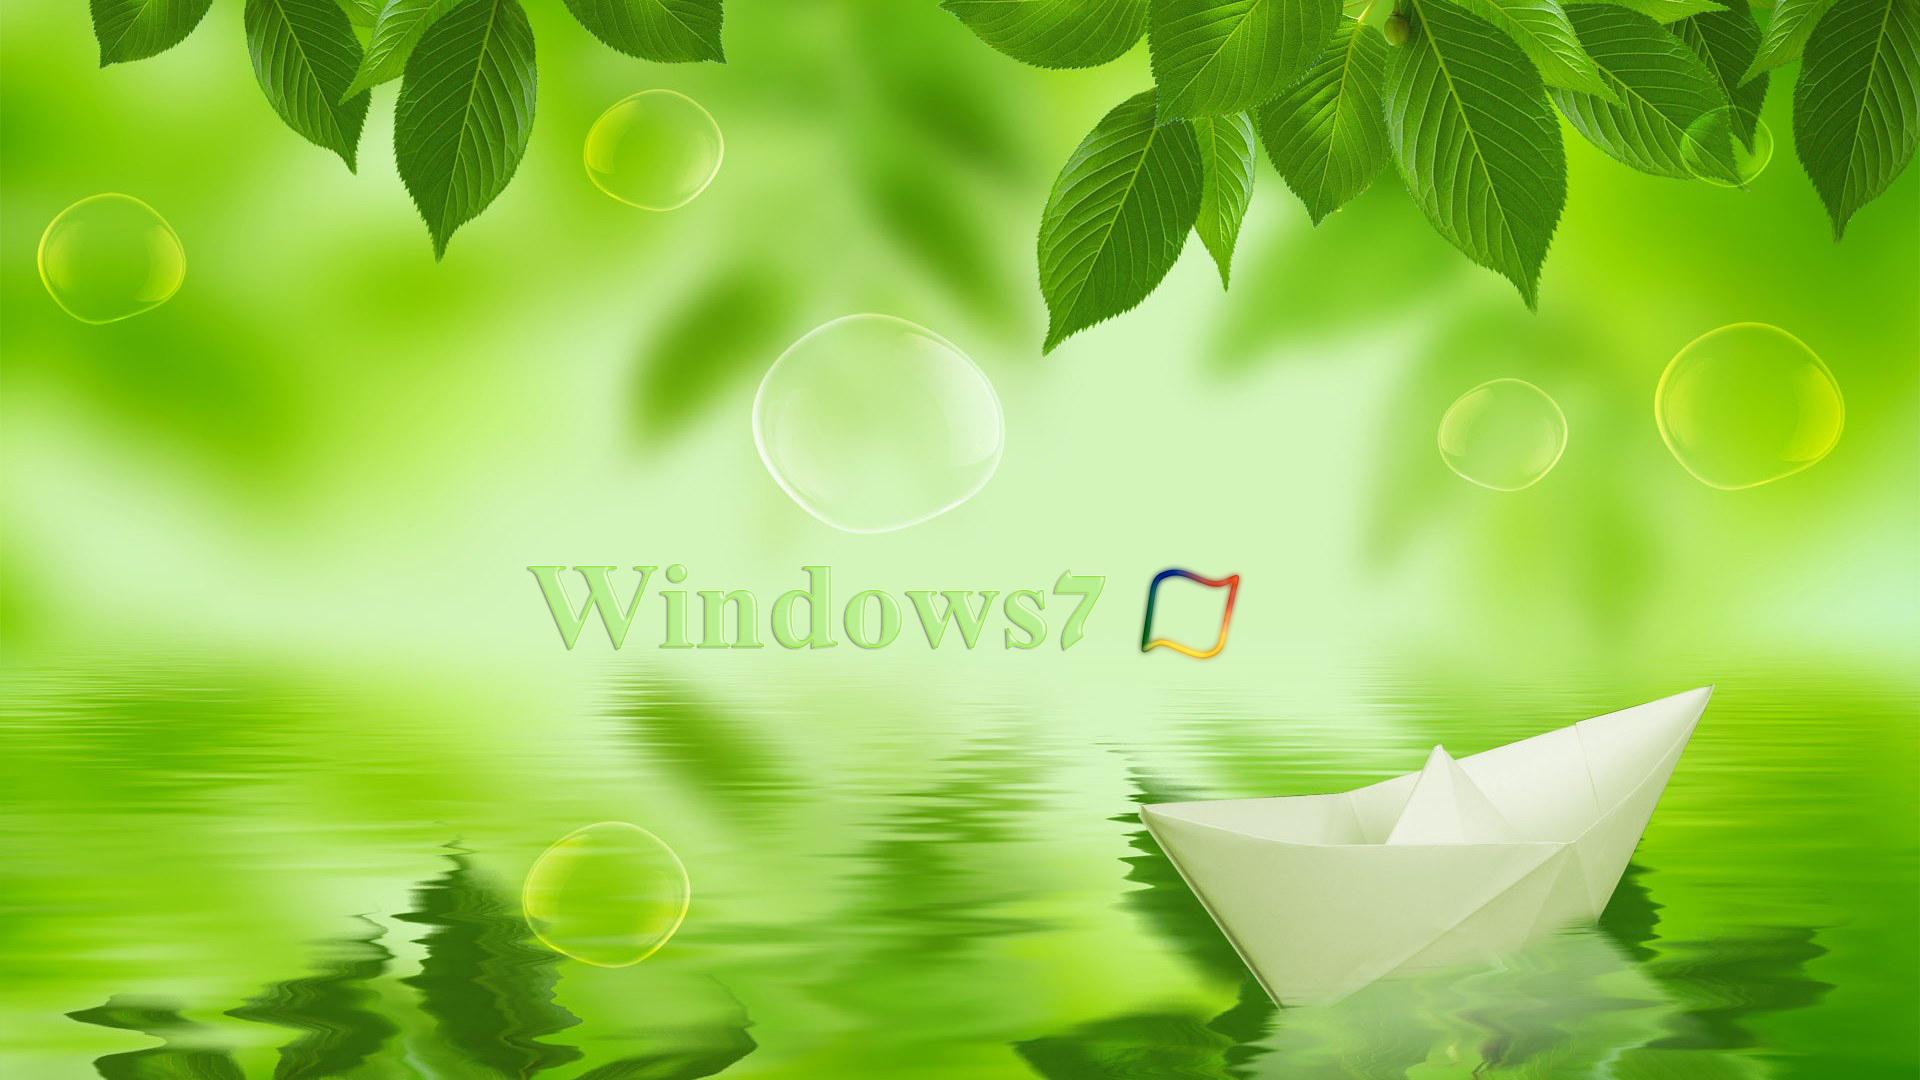 Wallpaper 3d Windows 7 Free Download خلفيات خضراء عالية الوضوح للتحميل مجانا